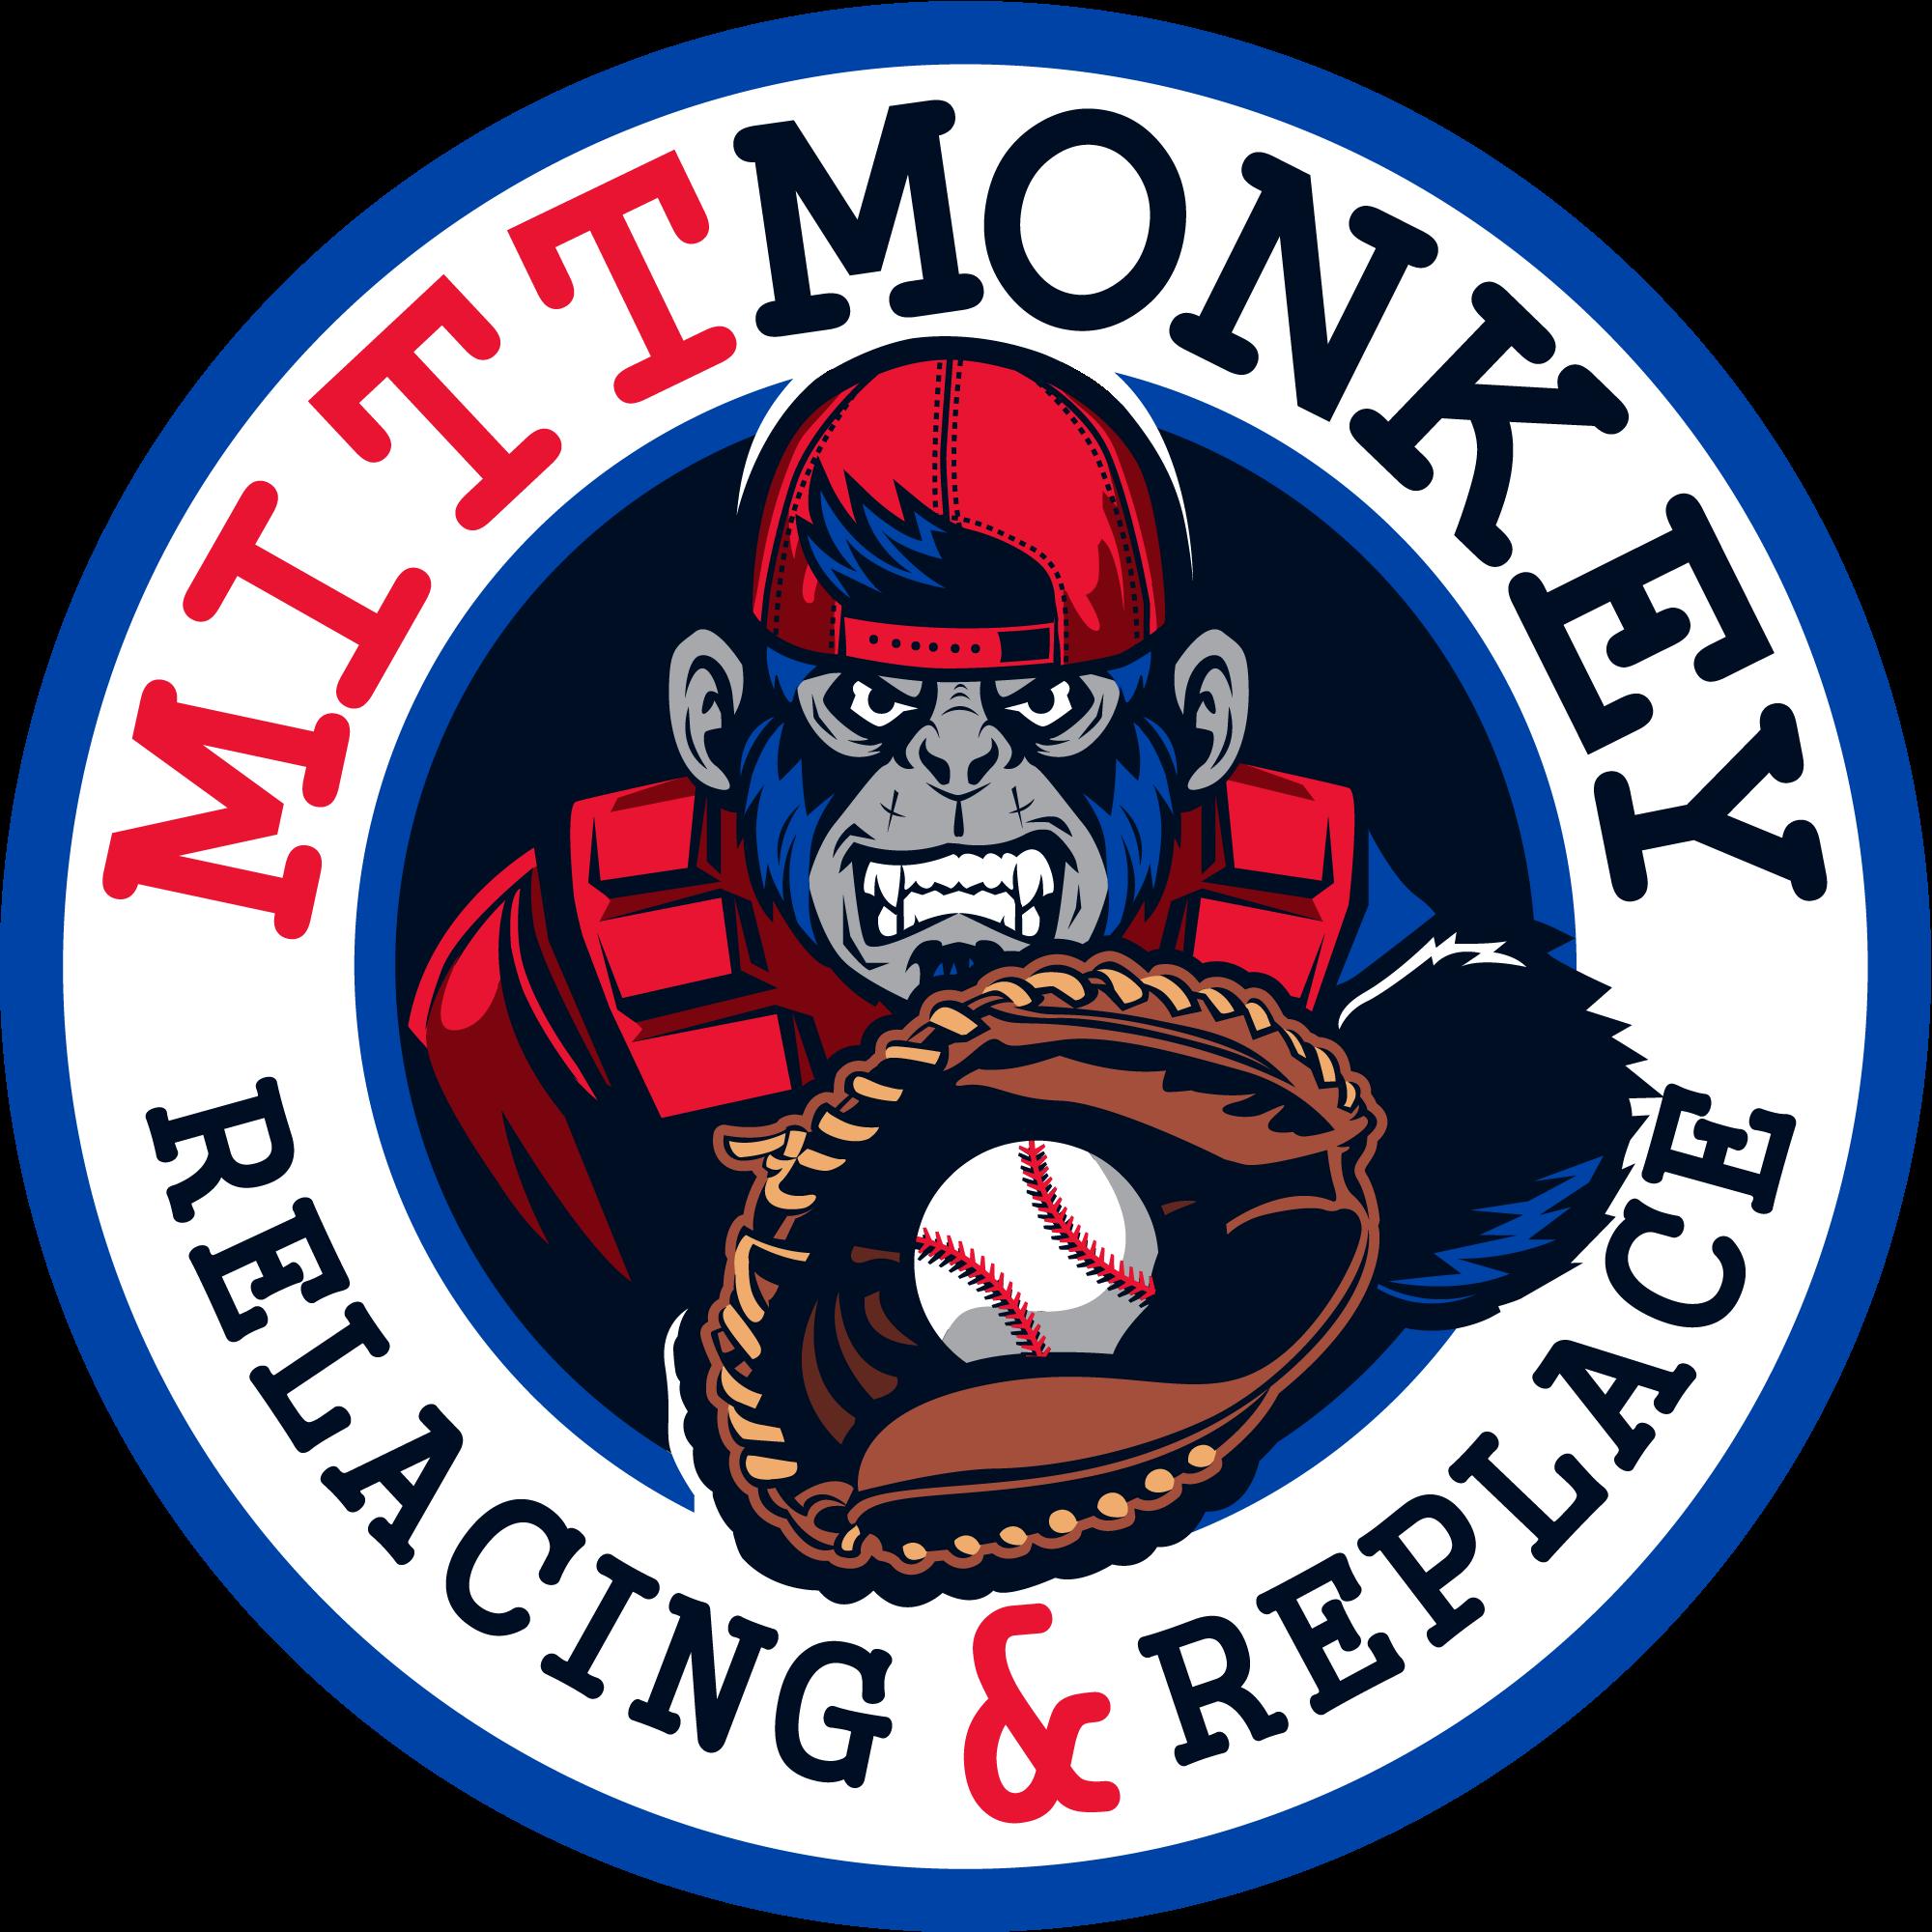 Create an eye-catching logo for Mitt Monkey